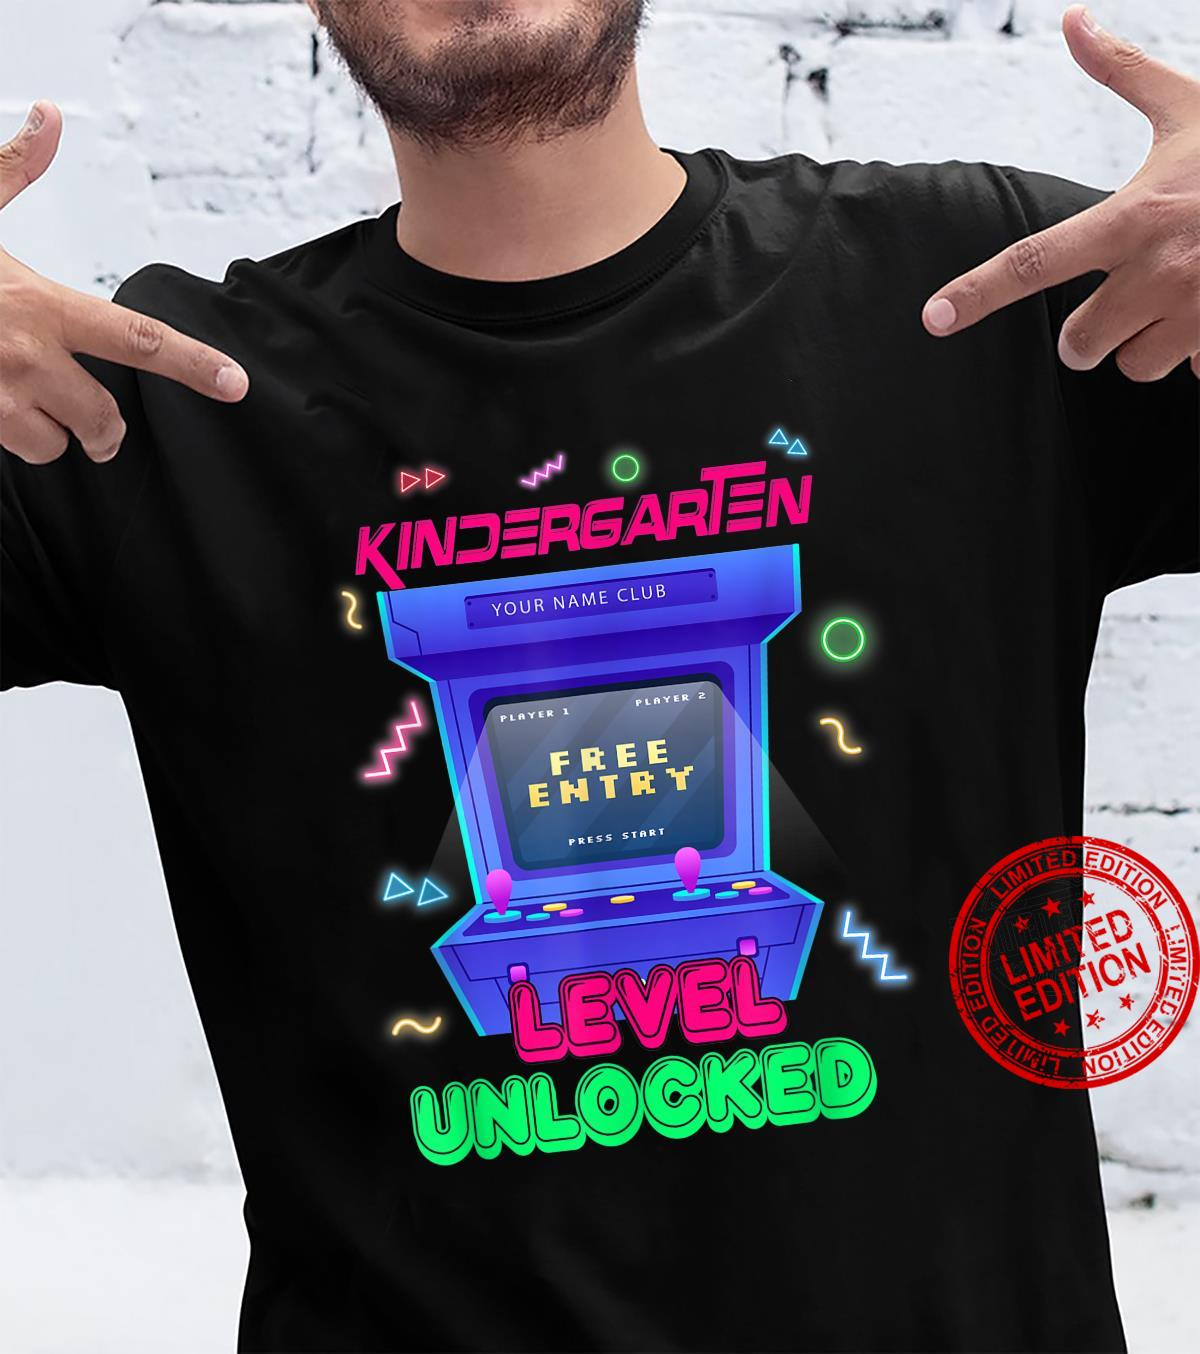 Kindergarten level unlocked First Day School Shirt